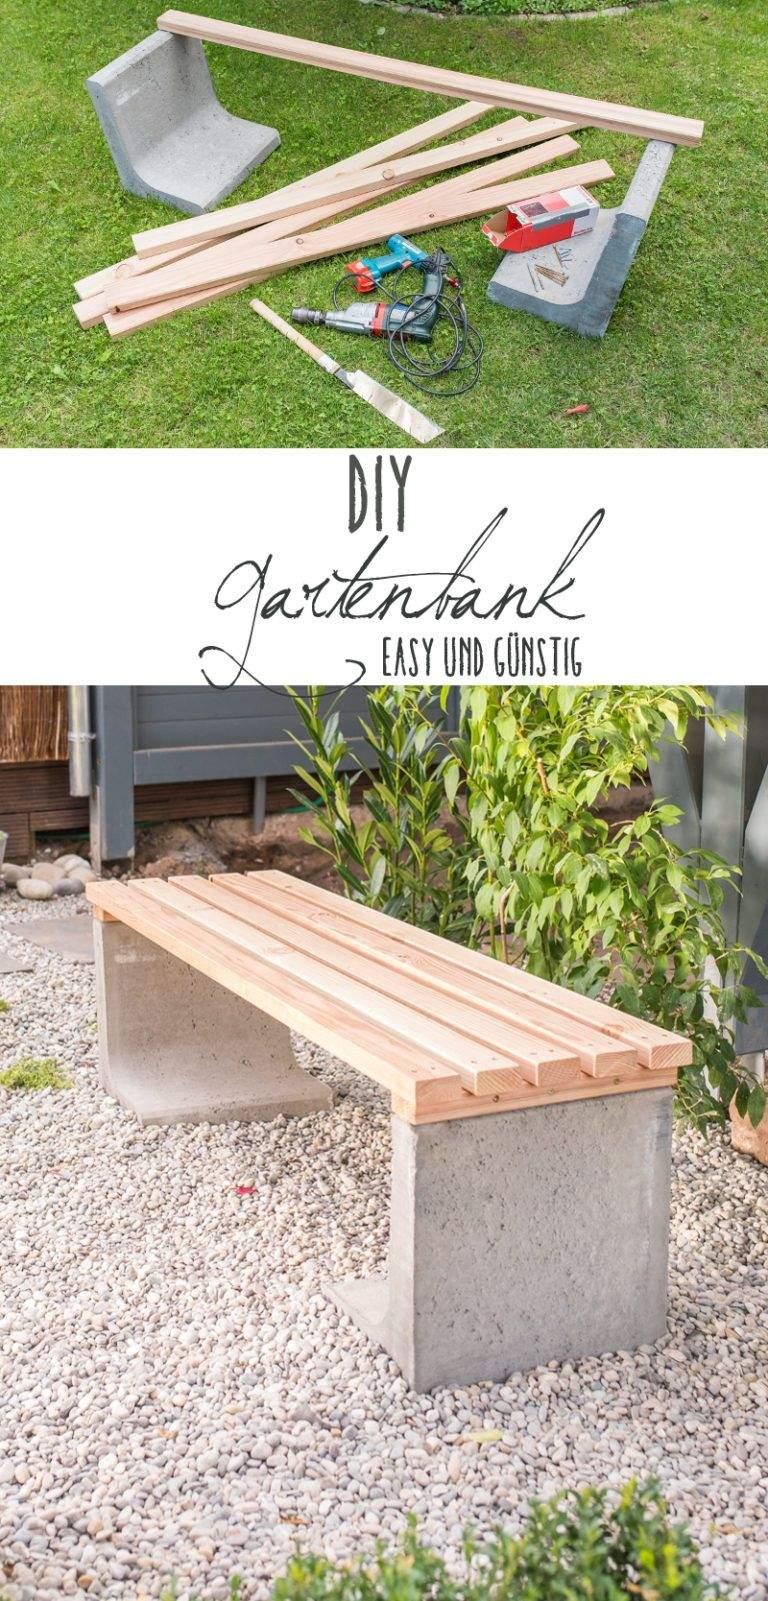 Sitzecke Garten Selber Bauen Inspirierend 33 Genial Sitzbank Holz Garten Reizend